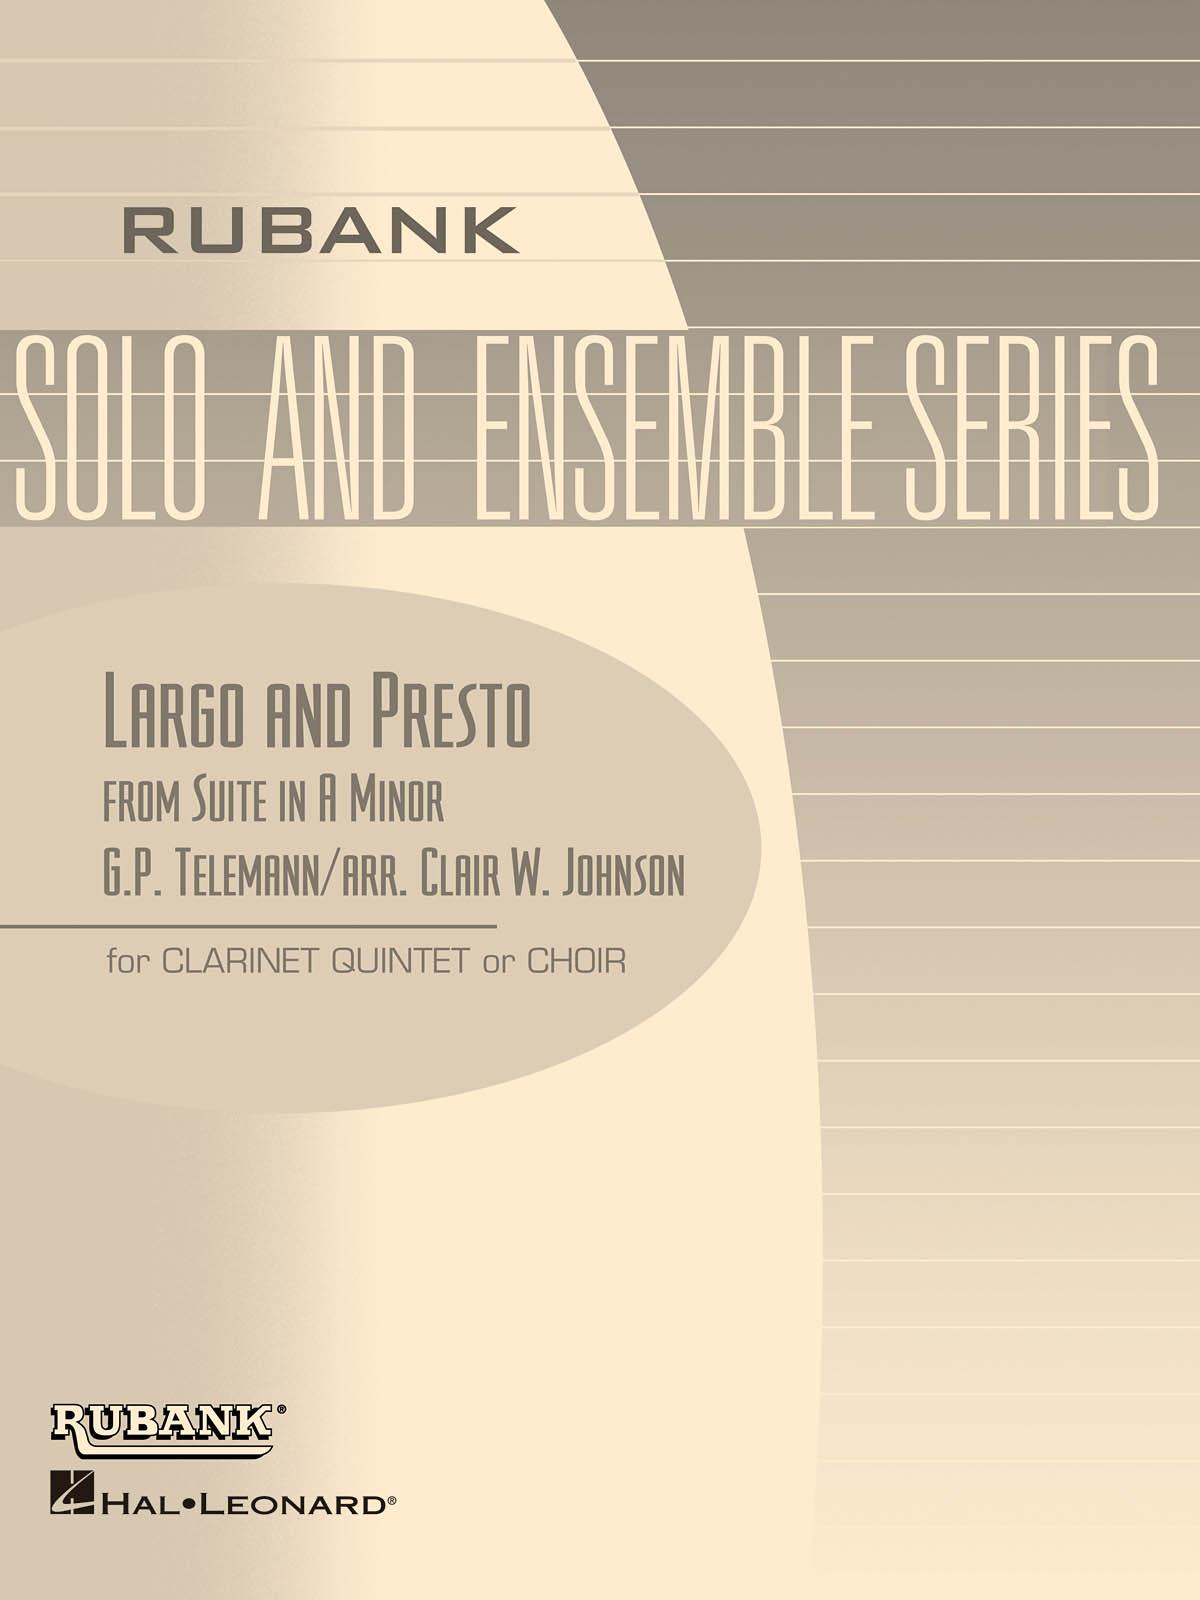 Georg Philipp Telemann: Largo and Presto (from Suite in A Minor): Clarinet